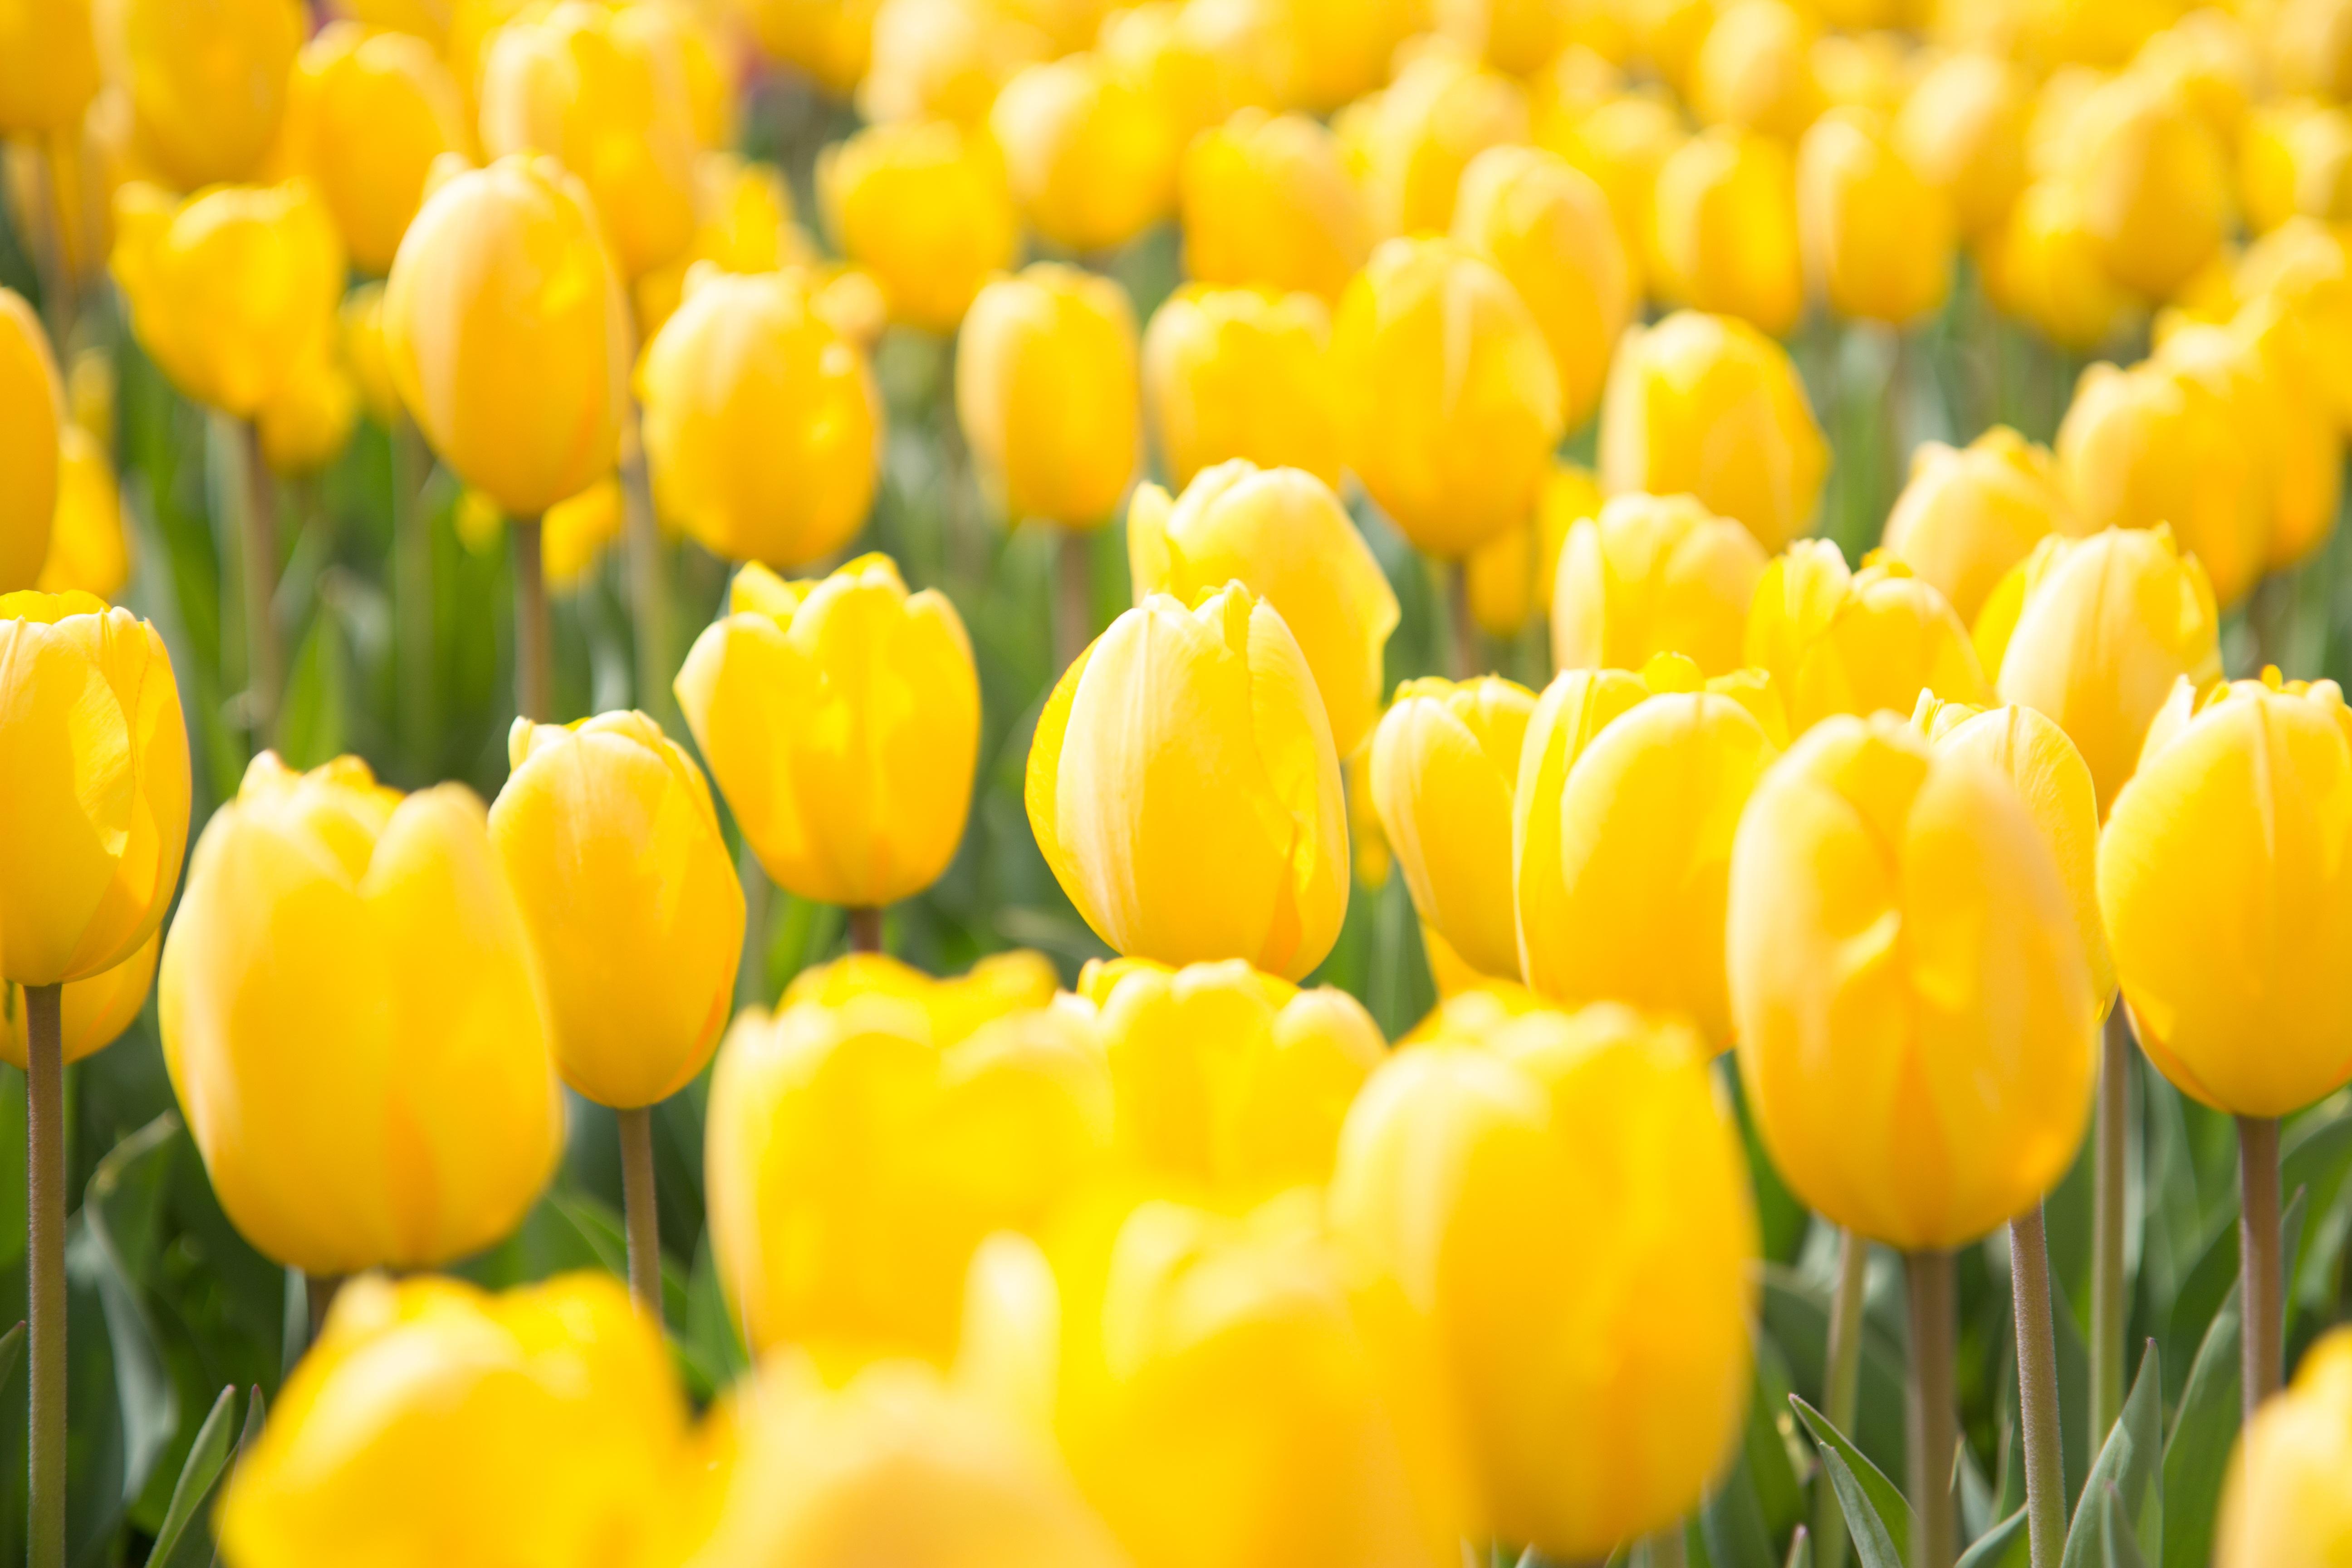 Free Images Flower Petal Tulip Spring Yellow Flowers Macro